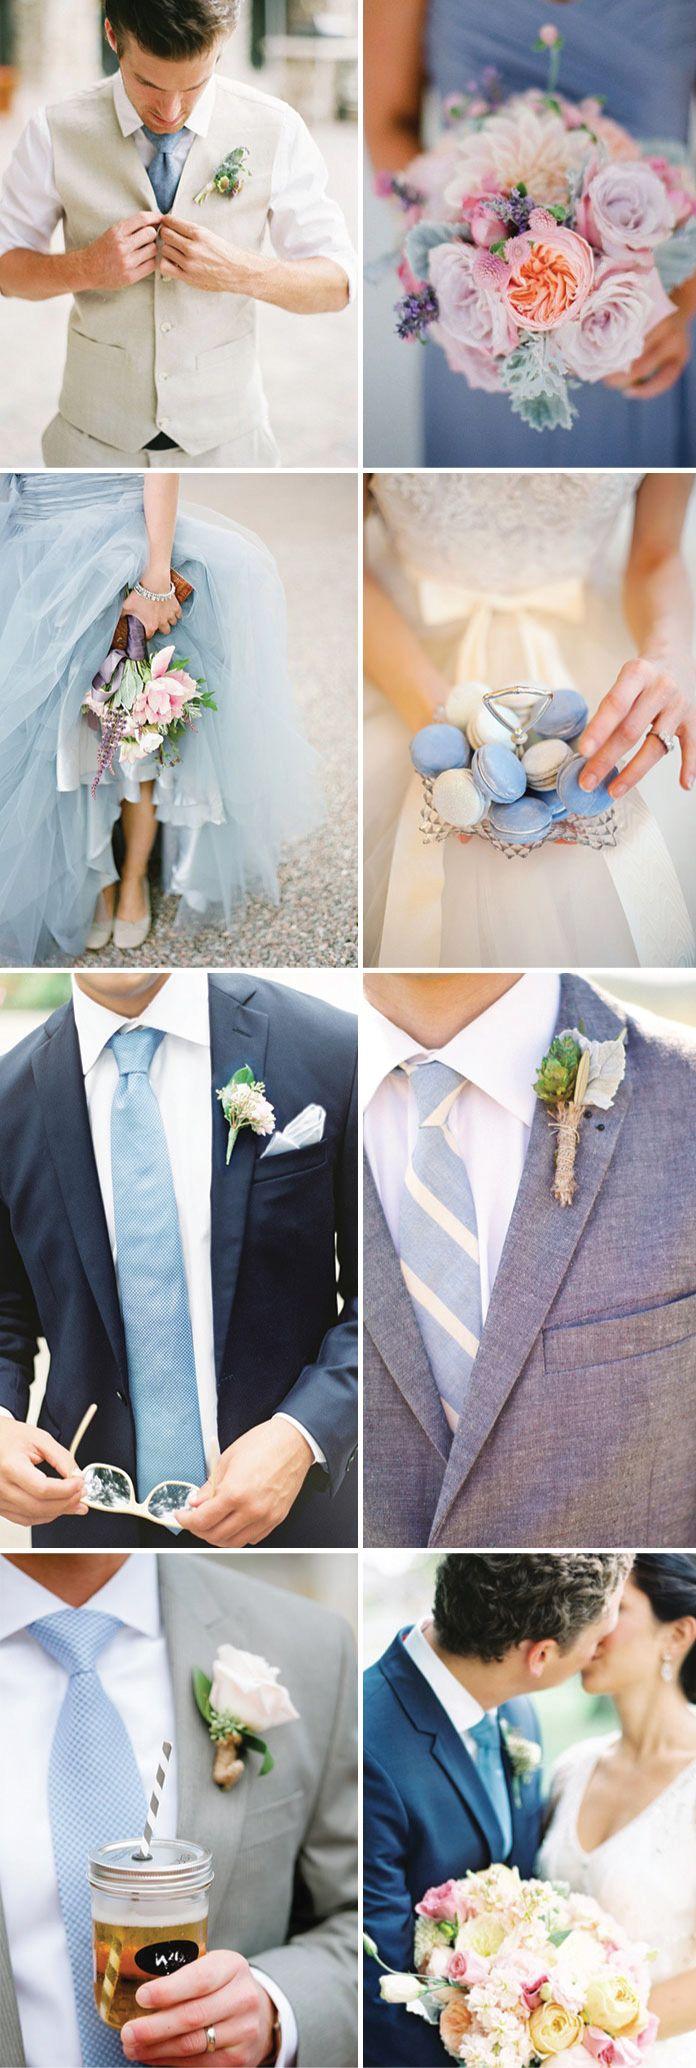 Wedding Looks in Cornflower Blue